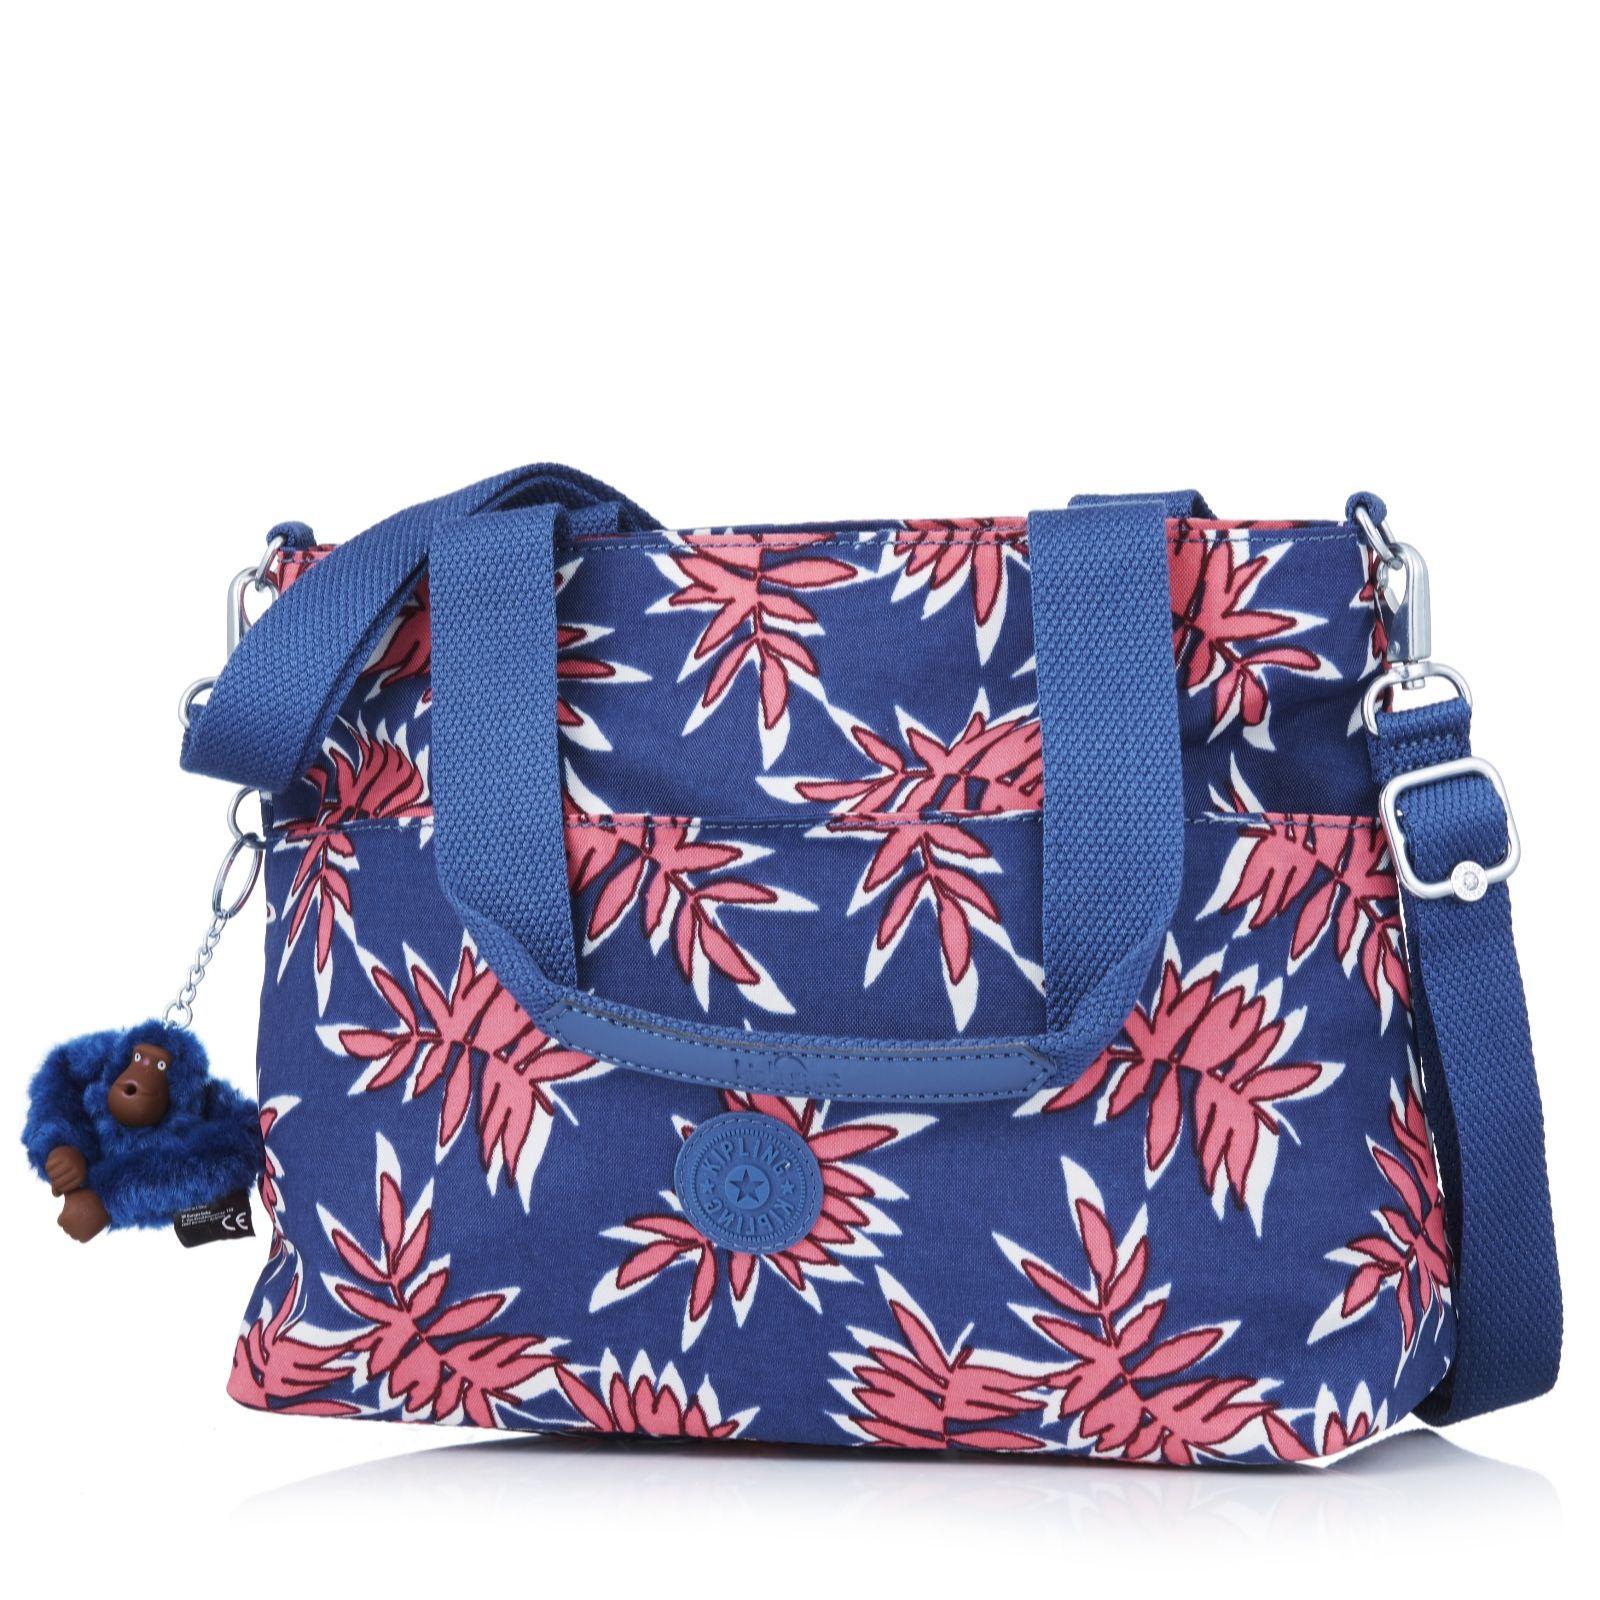 Kipling Marina Medium Double Handle Bag With Adjustable Shoulder